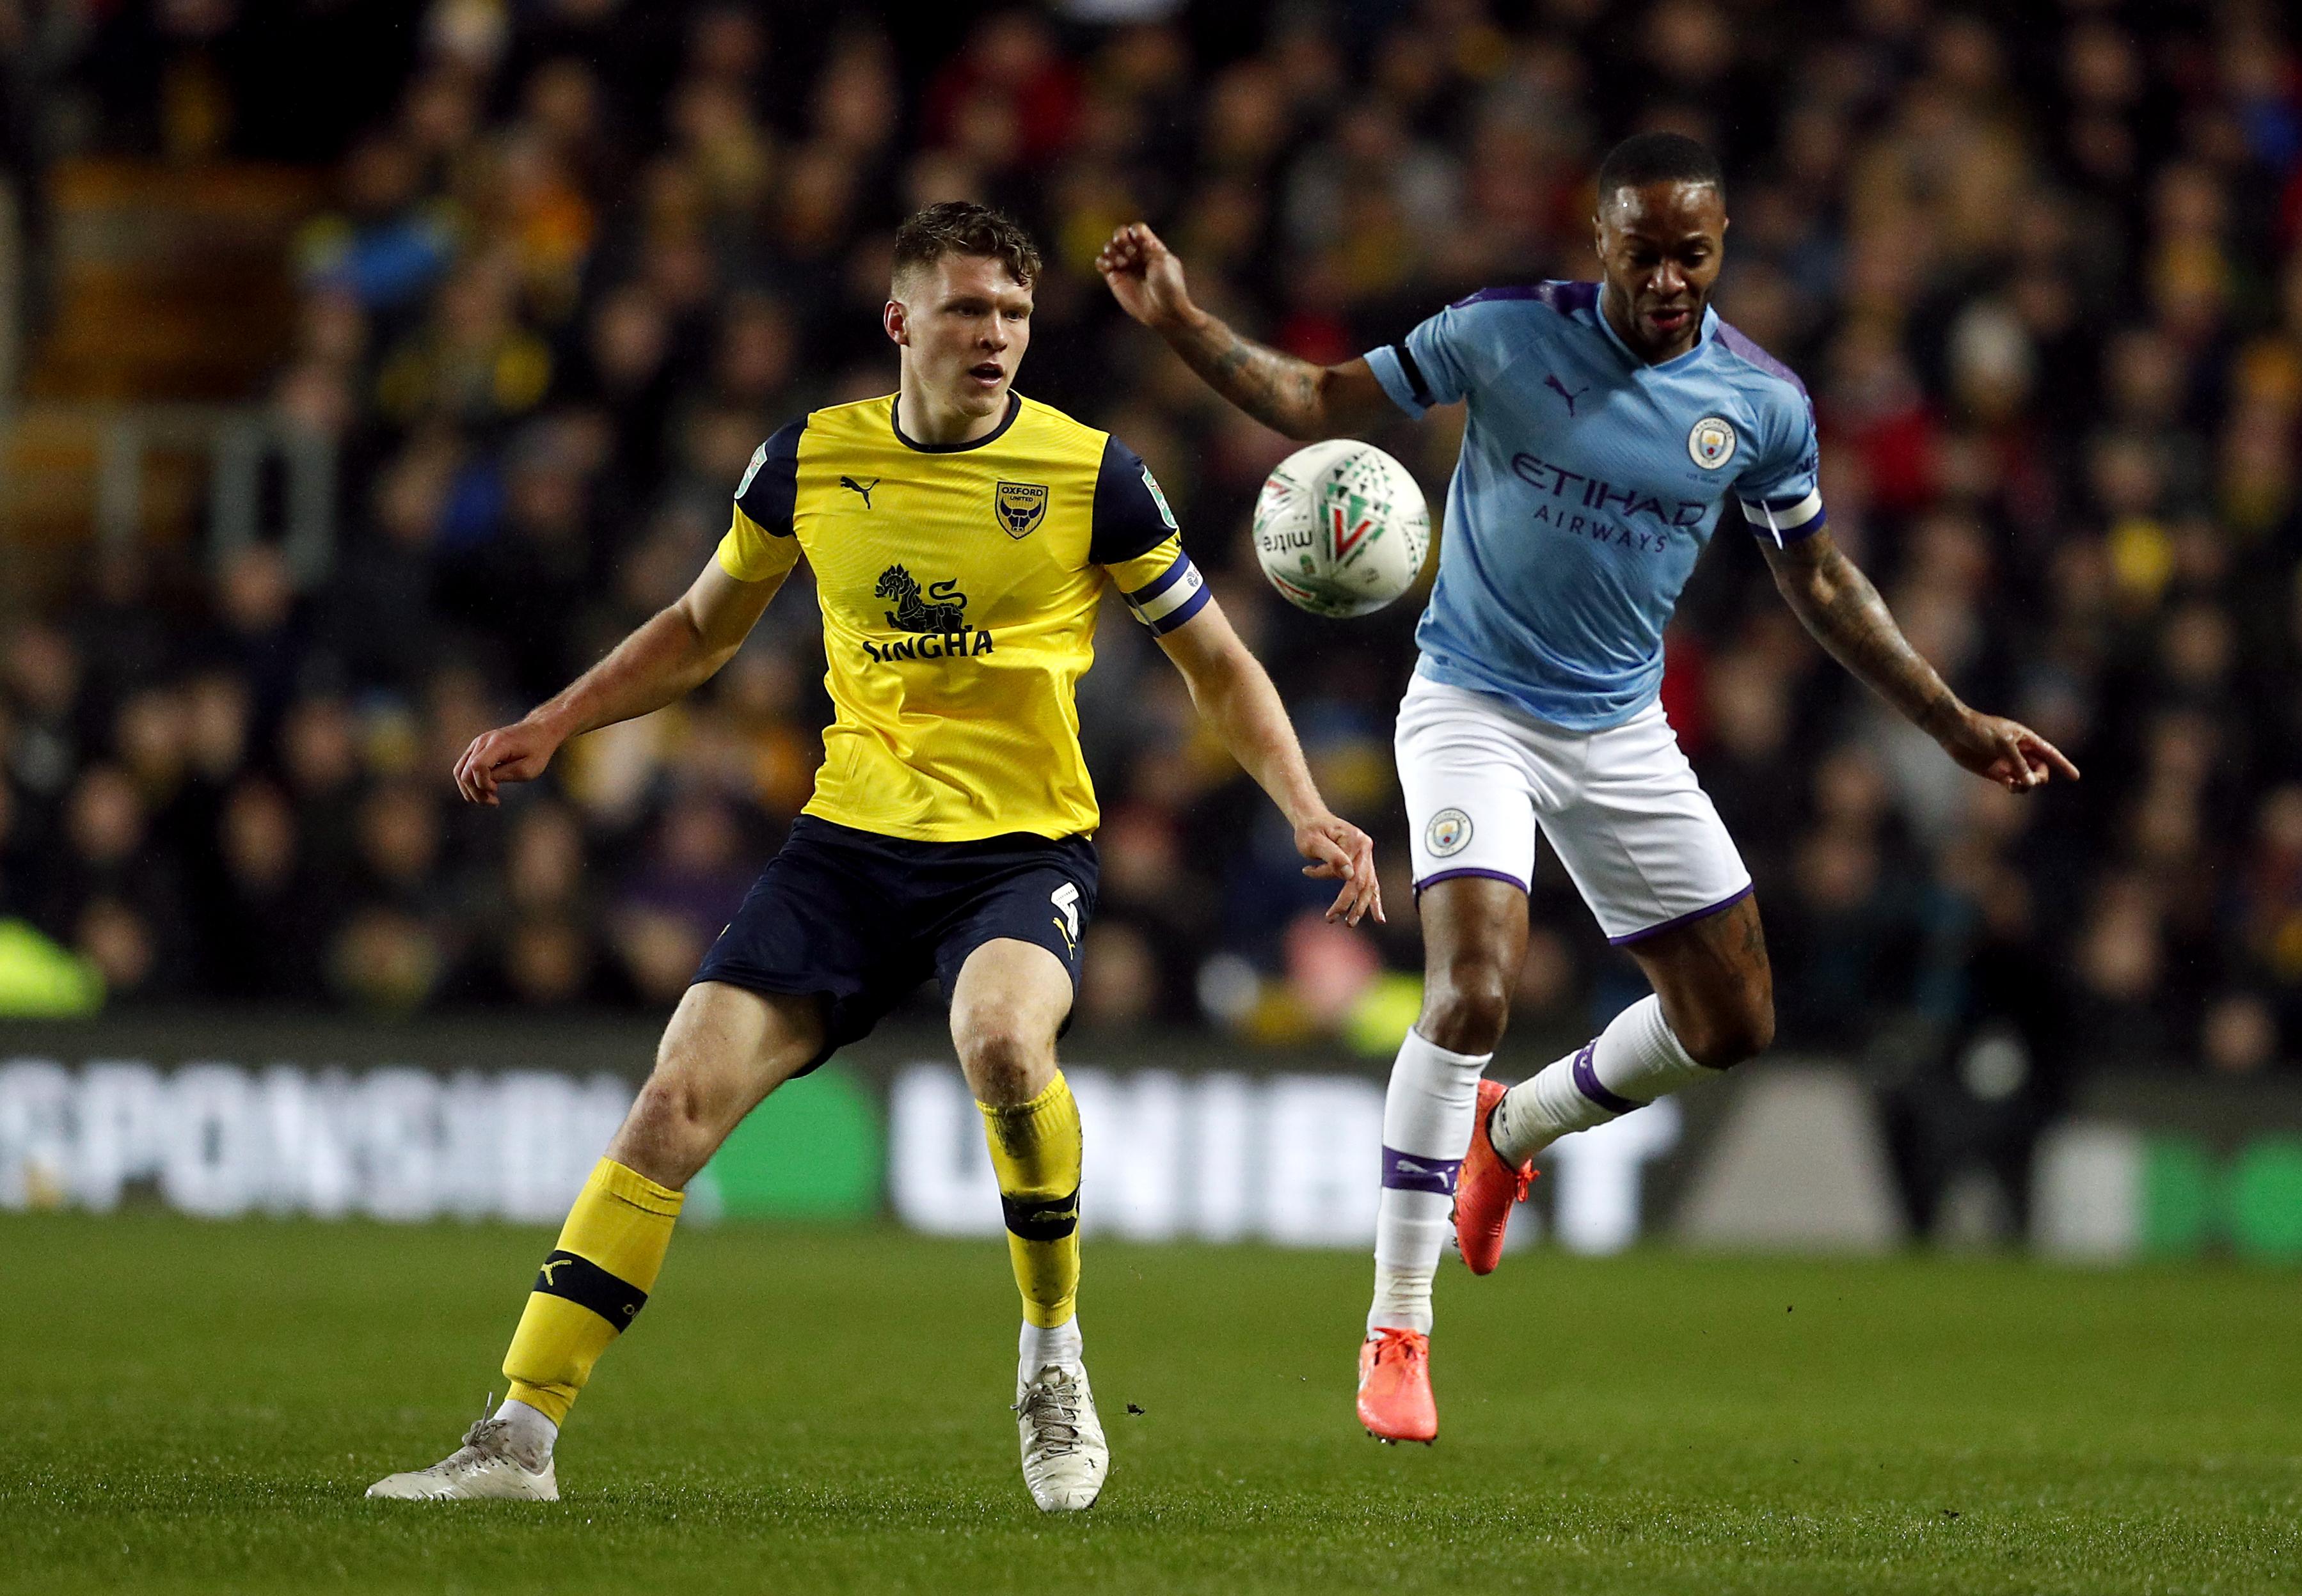 Oxford United v Manchester City - Carabao Cup - Quarter Final - Kassam Stadium